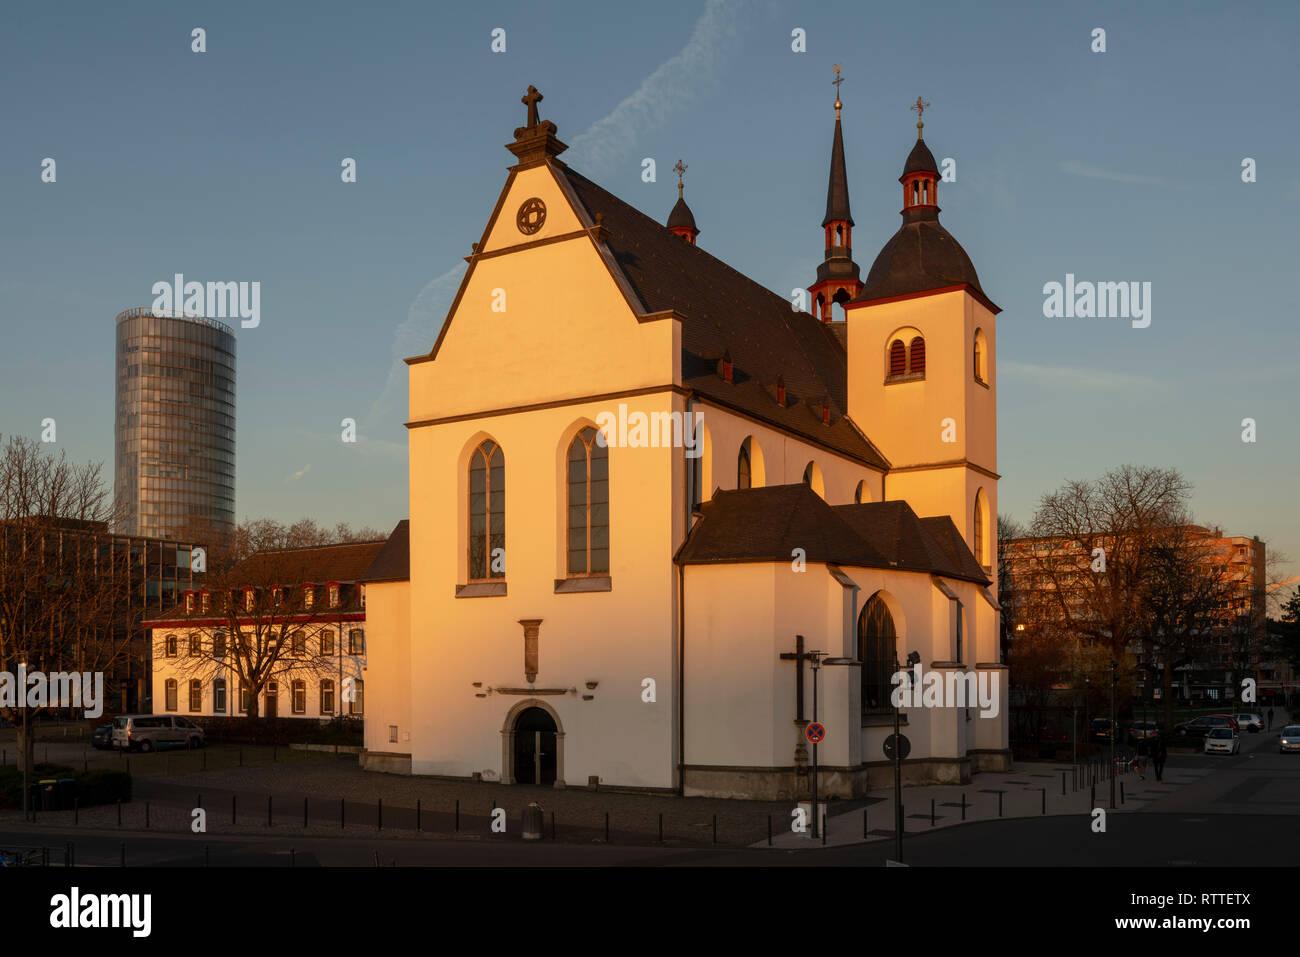 Köln-Deutz, Alt St. Heribert, dahinter das Hochhaus 'Kölntriangle' - Stock Image